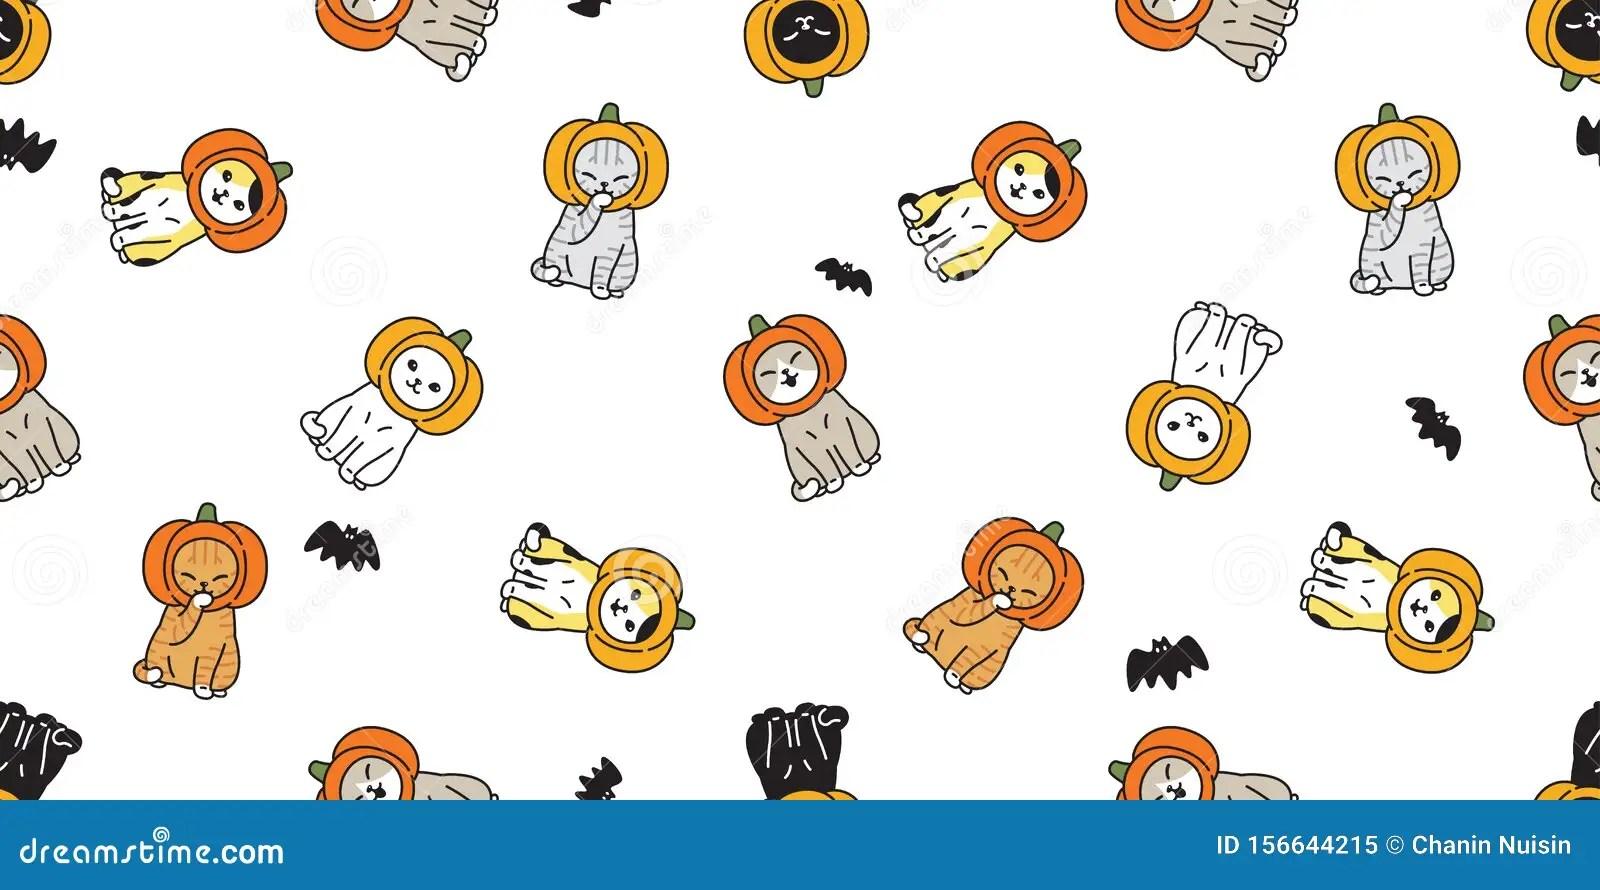 1920x1200 black cat halloween wallpaper pc. Cat Seamless Pattern Halloween Pumpkin Head Kitten Calico Bat Scarf Isolated Tile Background Repeat Wallpaper Cartoon Illus Stock Illustration Illustration Of Meow Icon 156644215